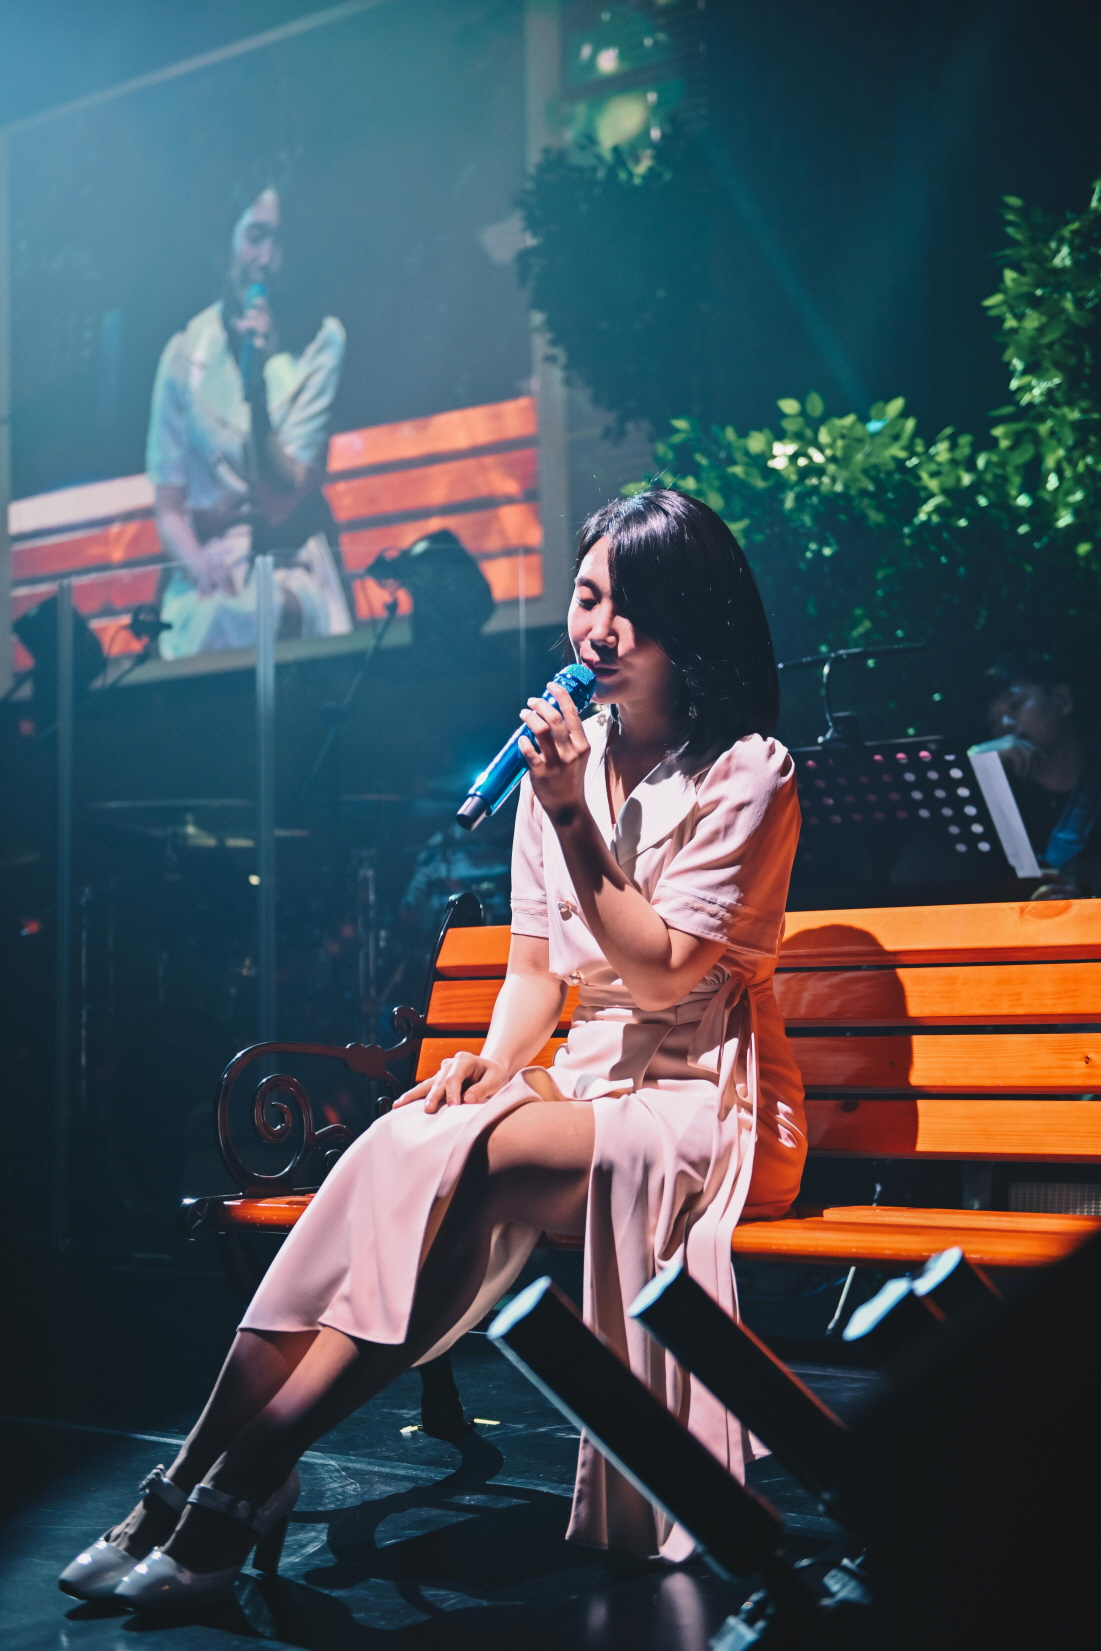 Official Show Photos & Rundown – Jeong EunJi 1ST Hong Kong Concert [HyeHwa] on 2019/05/18